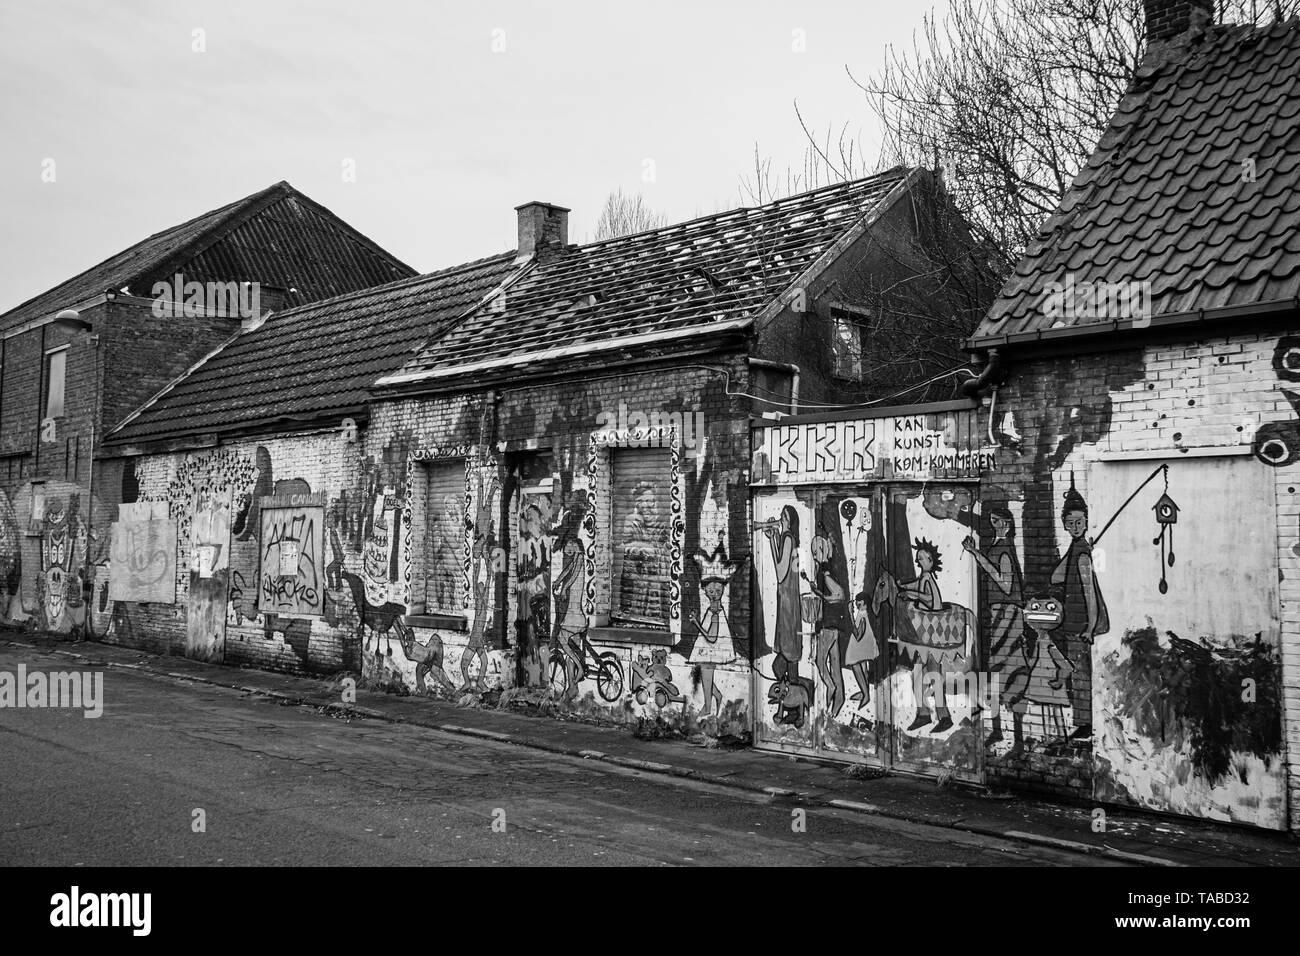 Abandoned town of Doel in Belgium - Stock Image